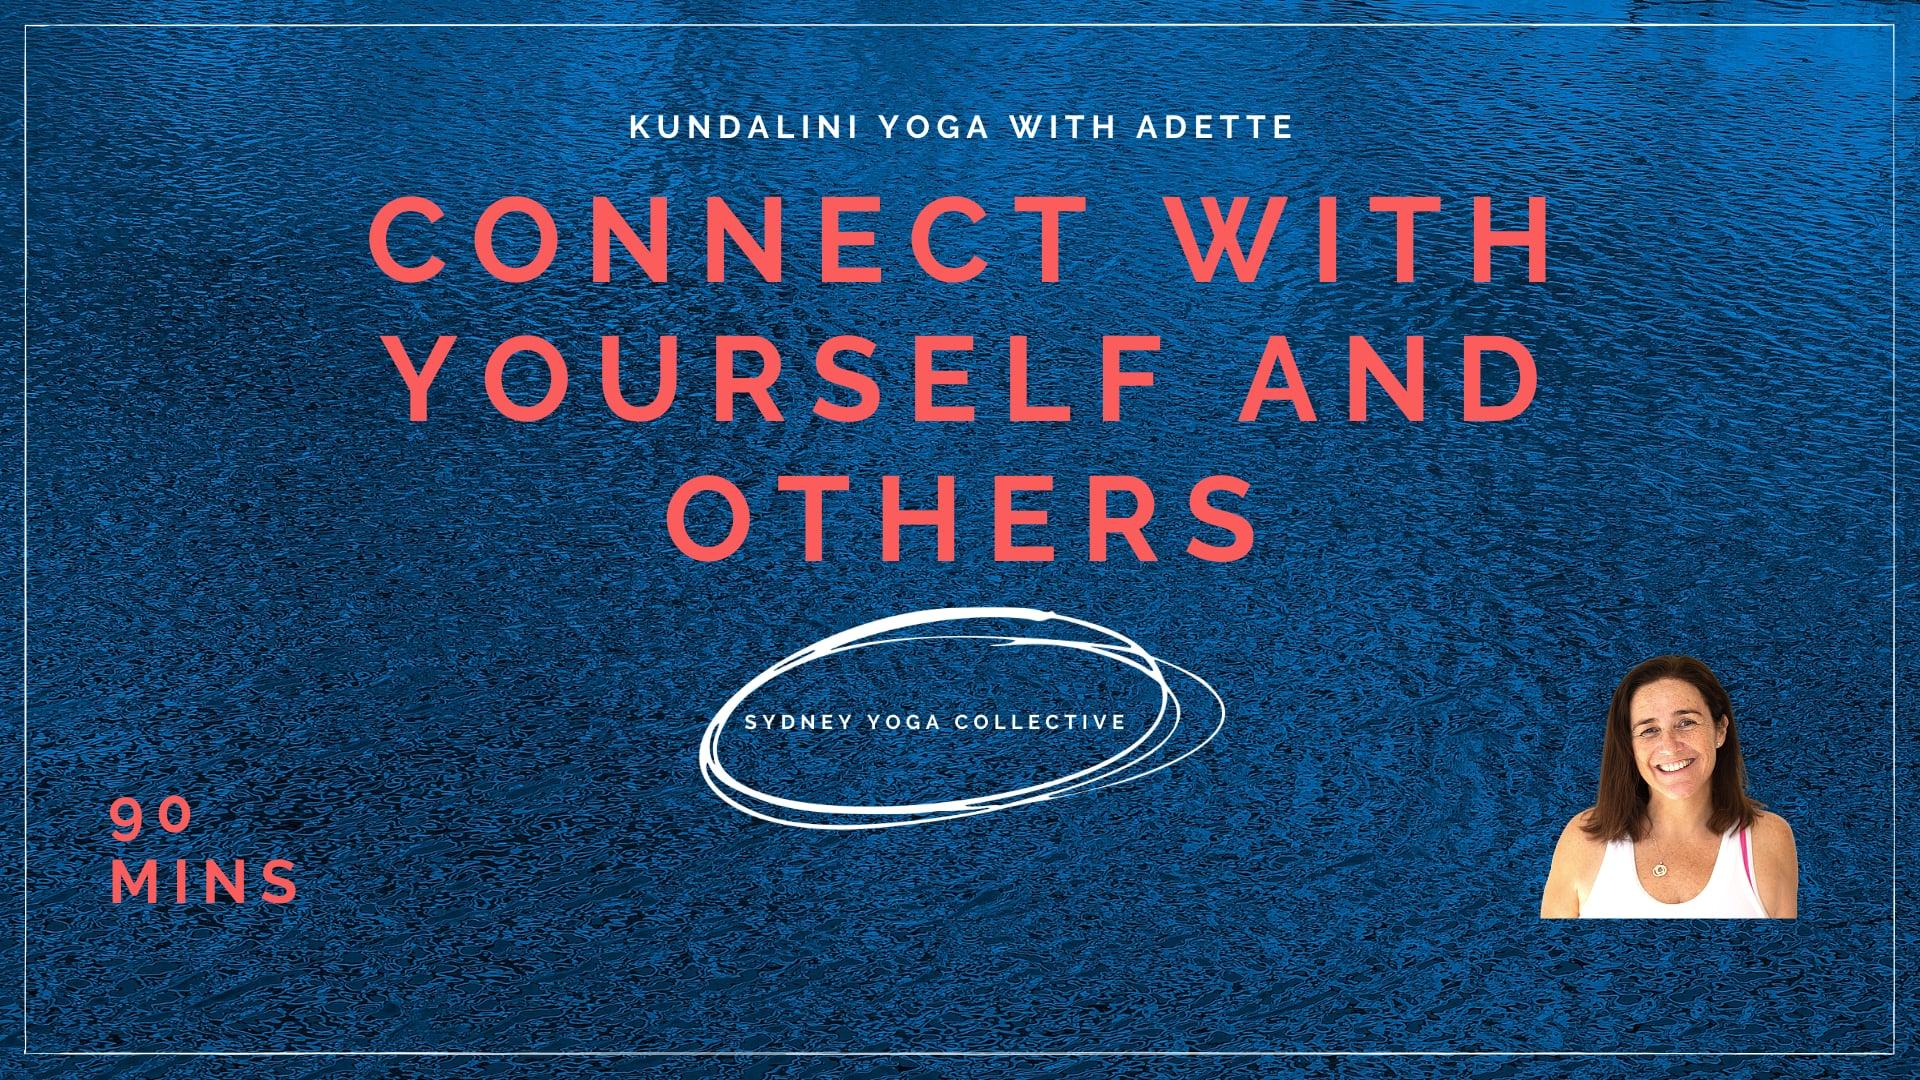 Kundalini Yoga with Adette